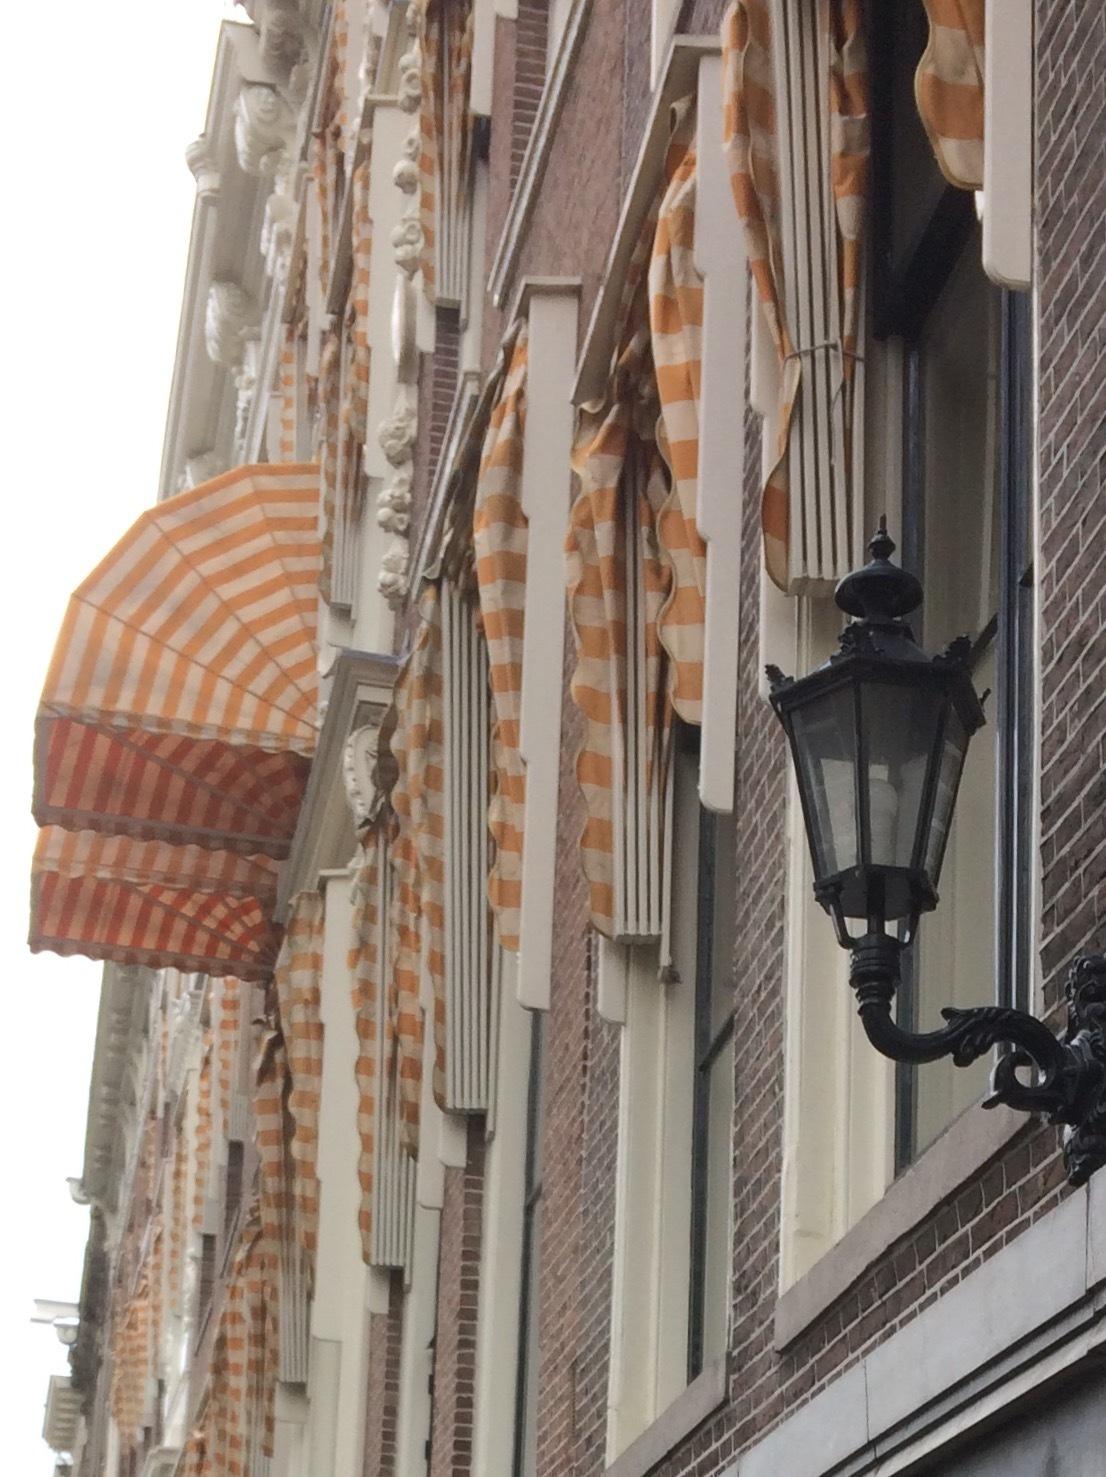 Amsterdam façades by Silvia Mengotti